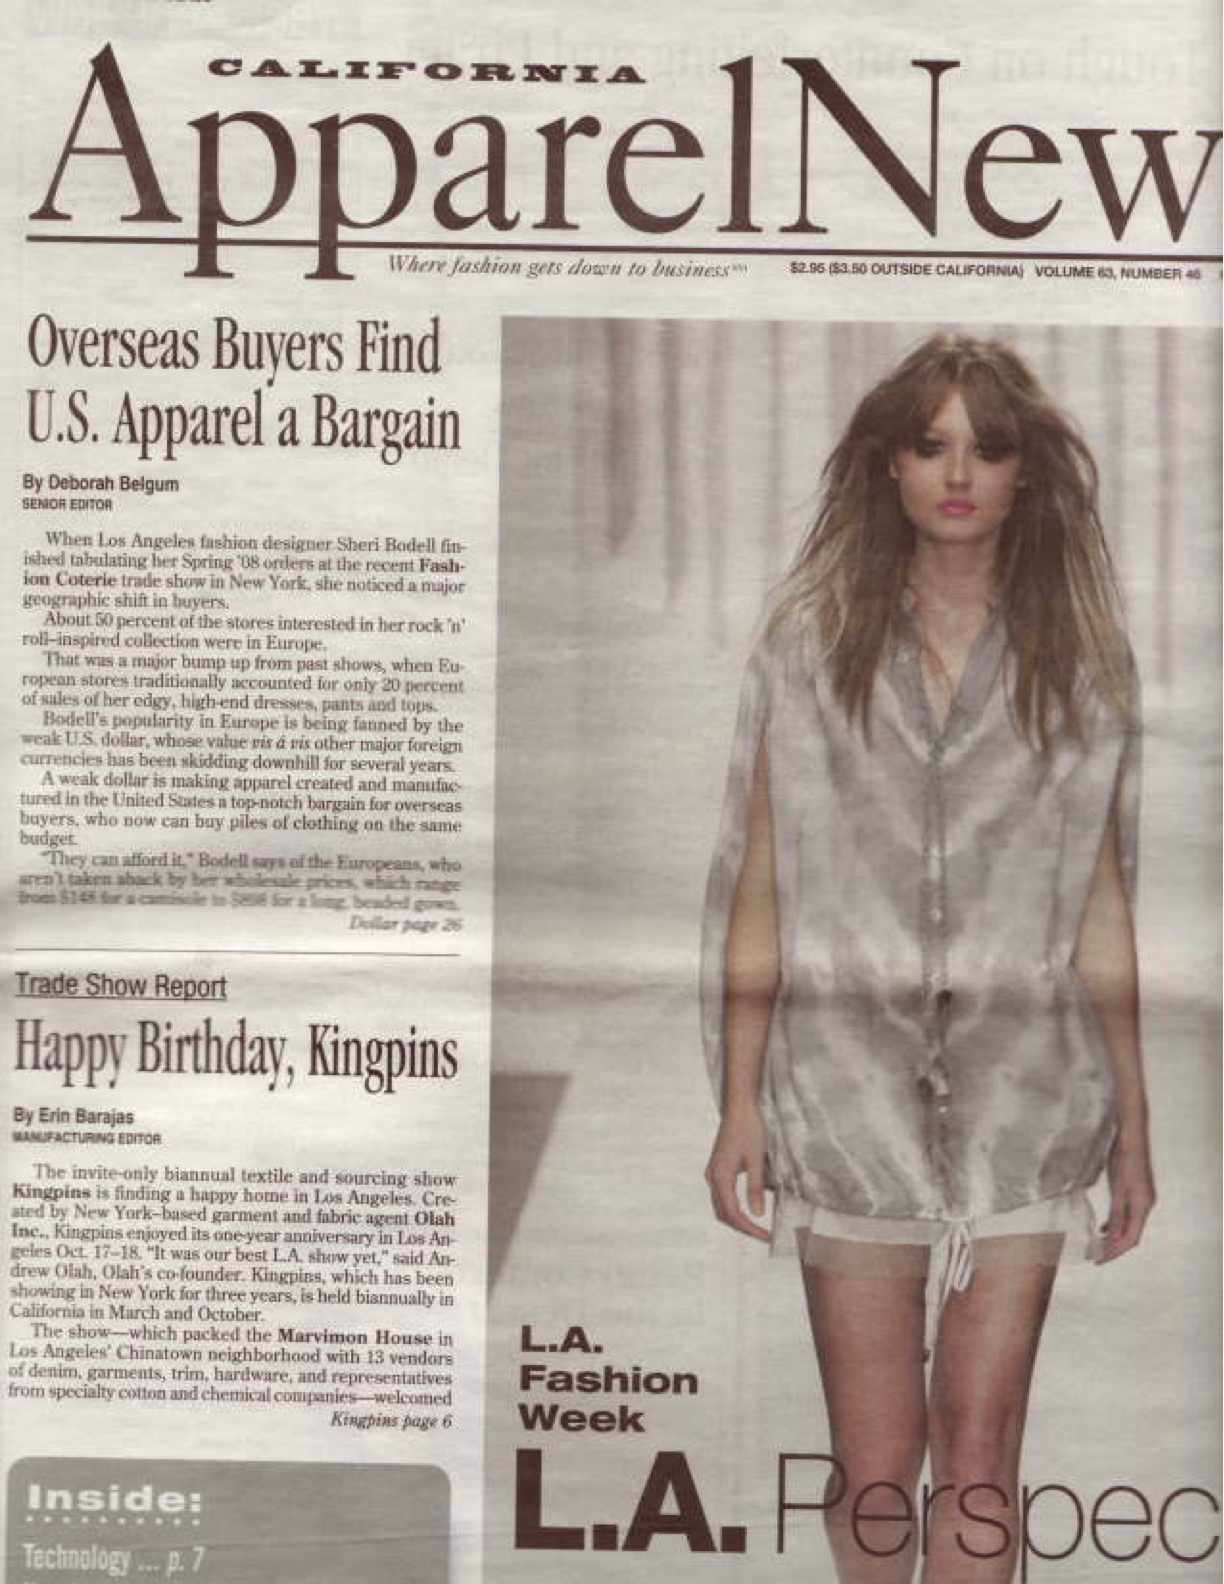 apparel news.jpg